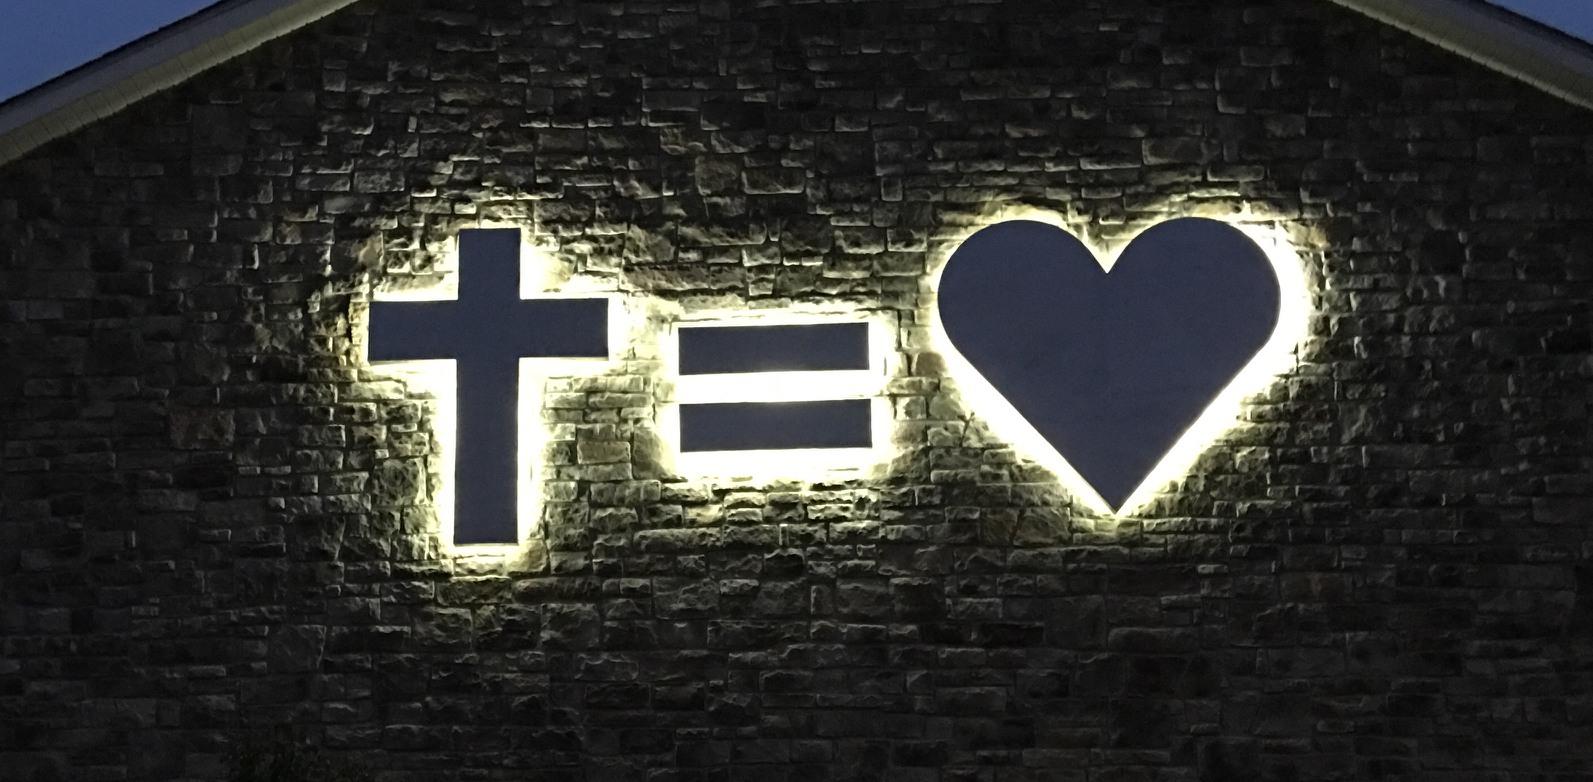 Custom Backlit Sign For Life Church. Nazareth, PA